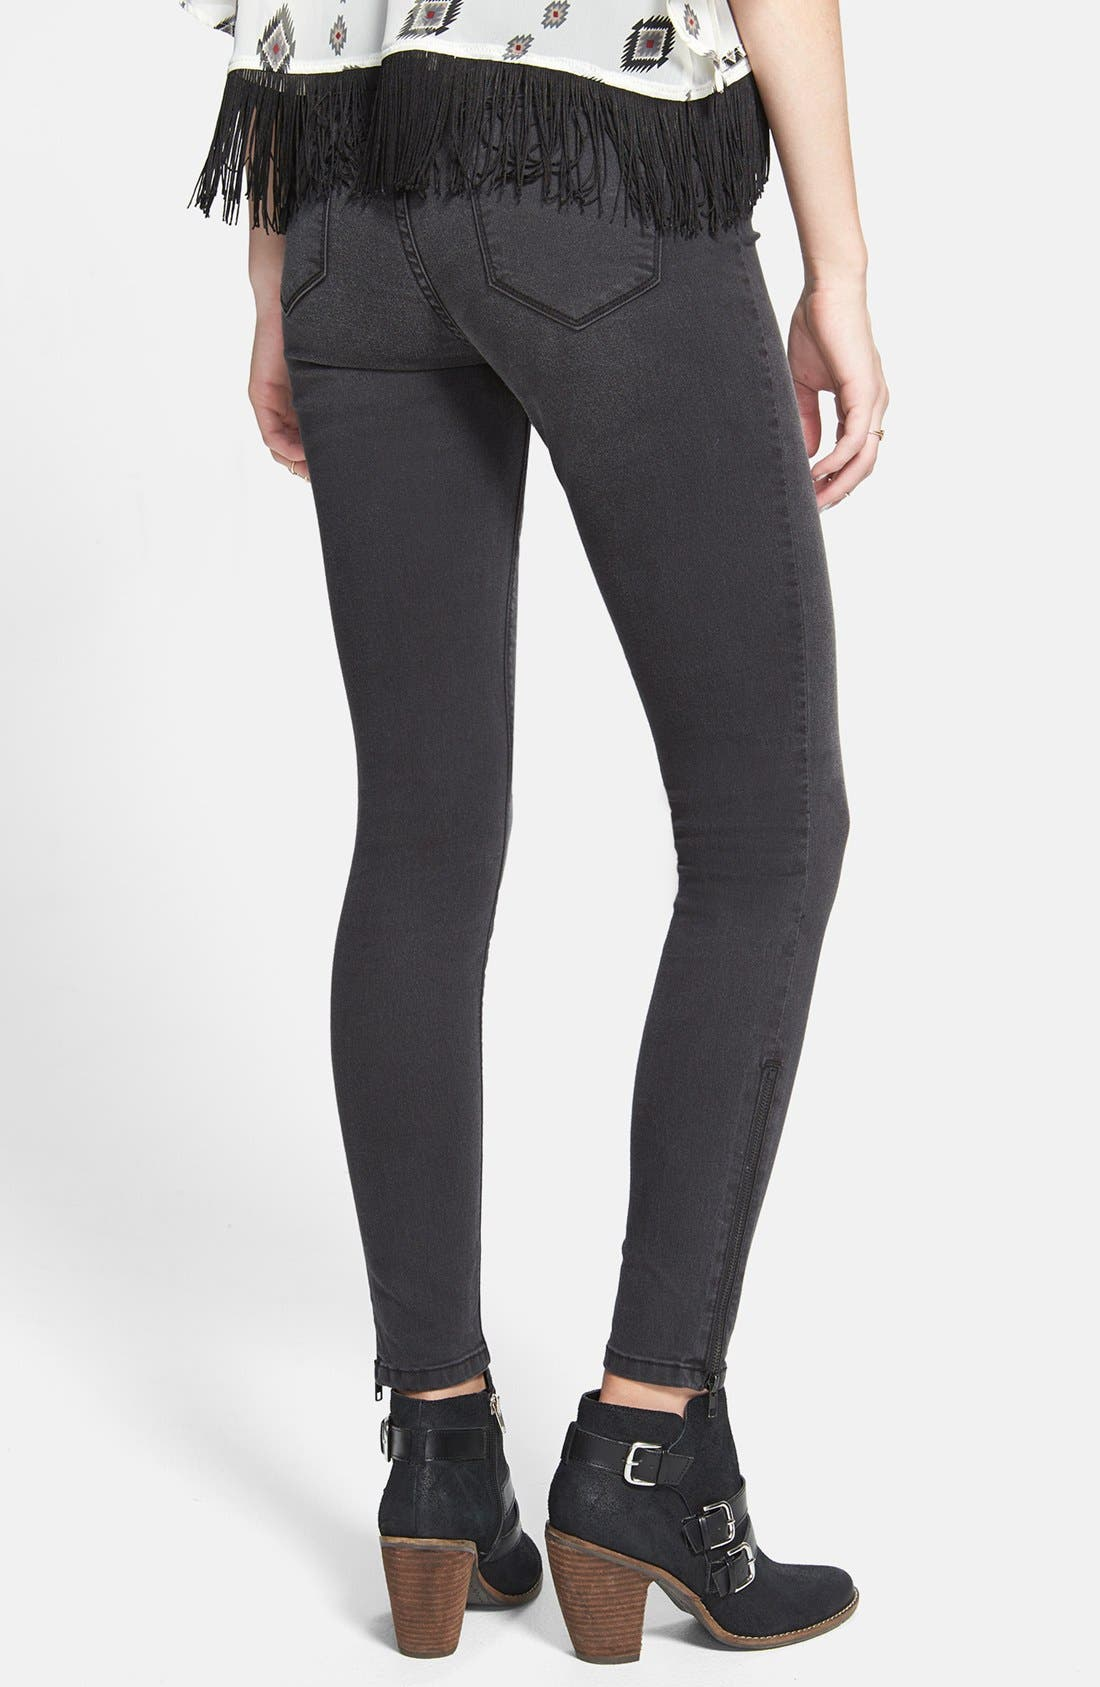 Alternate Image 2  - SP Black High Waist Ankle Zip Skinny Jeans (Dark Grey) (Juniors) (Online Only)